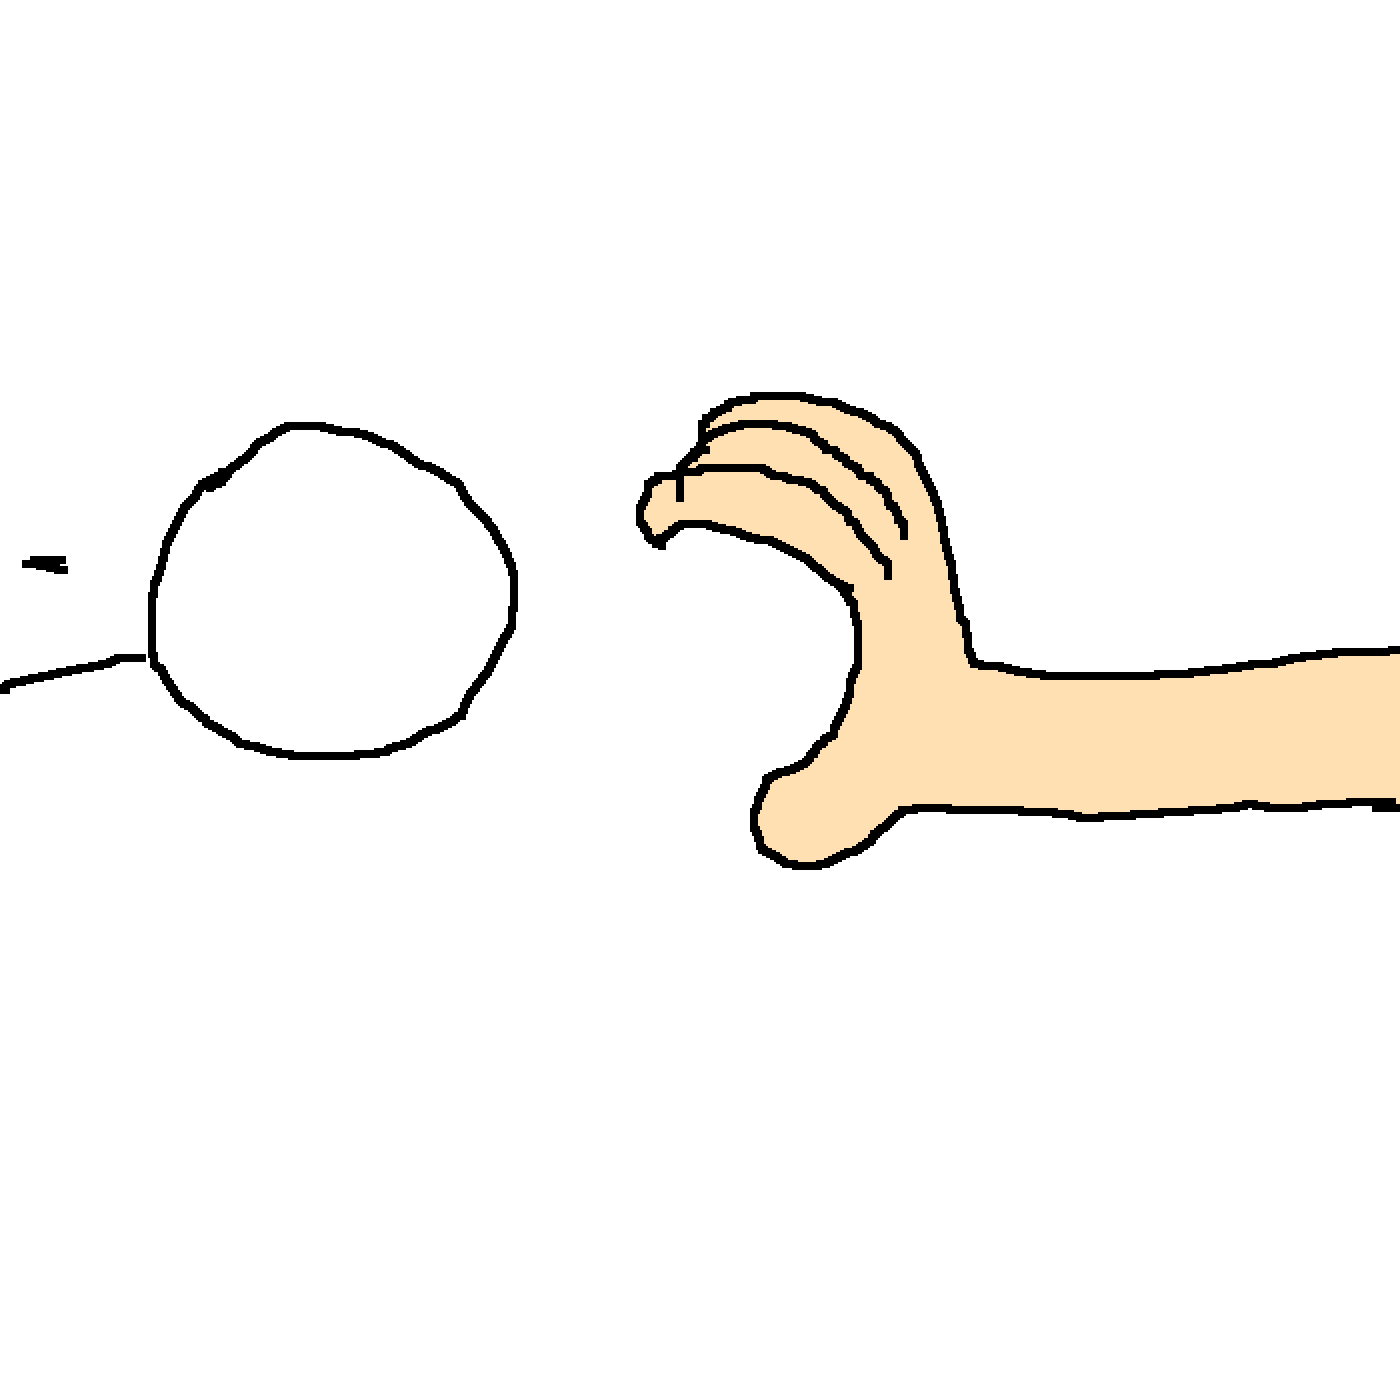 Pixilart Catching Da Ball By Dragon111